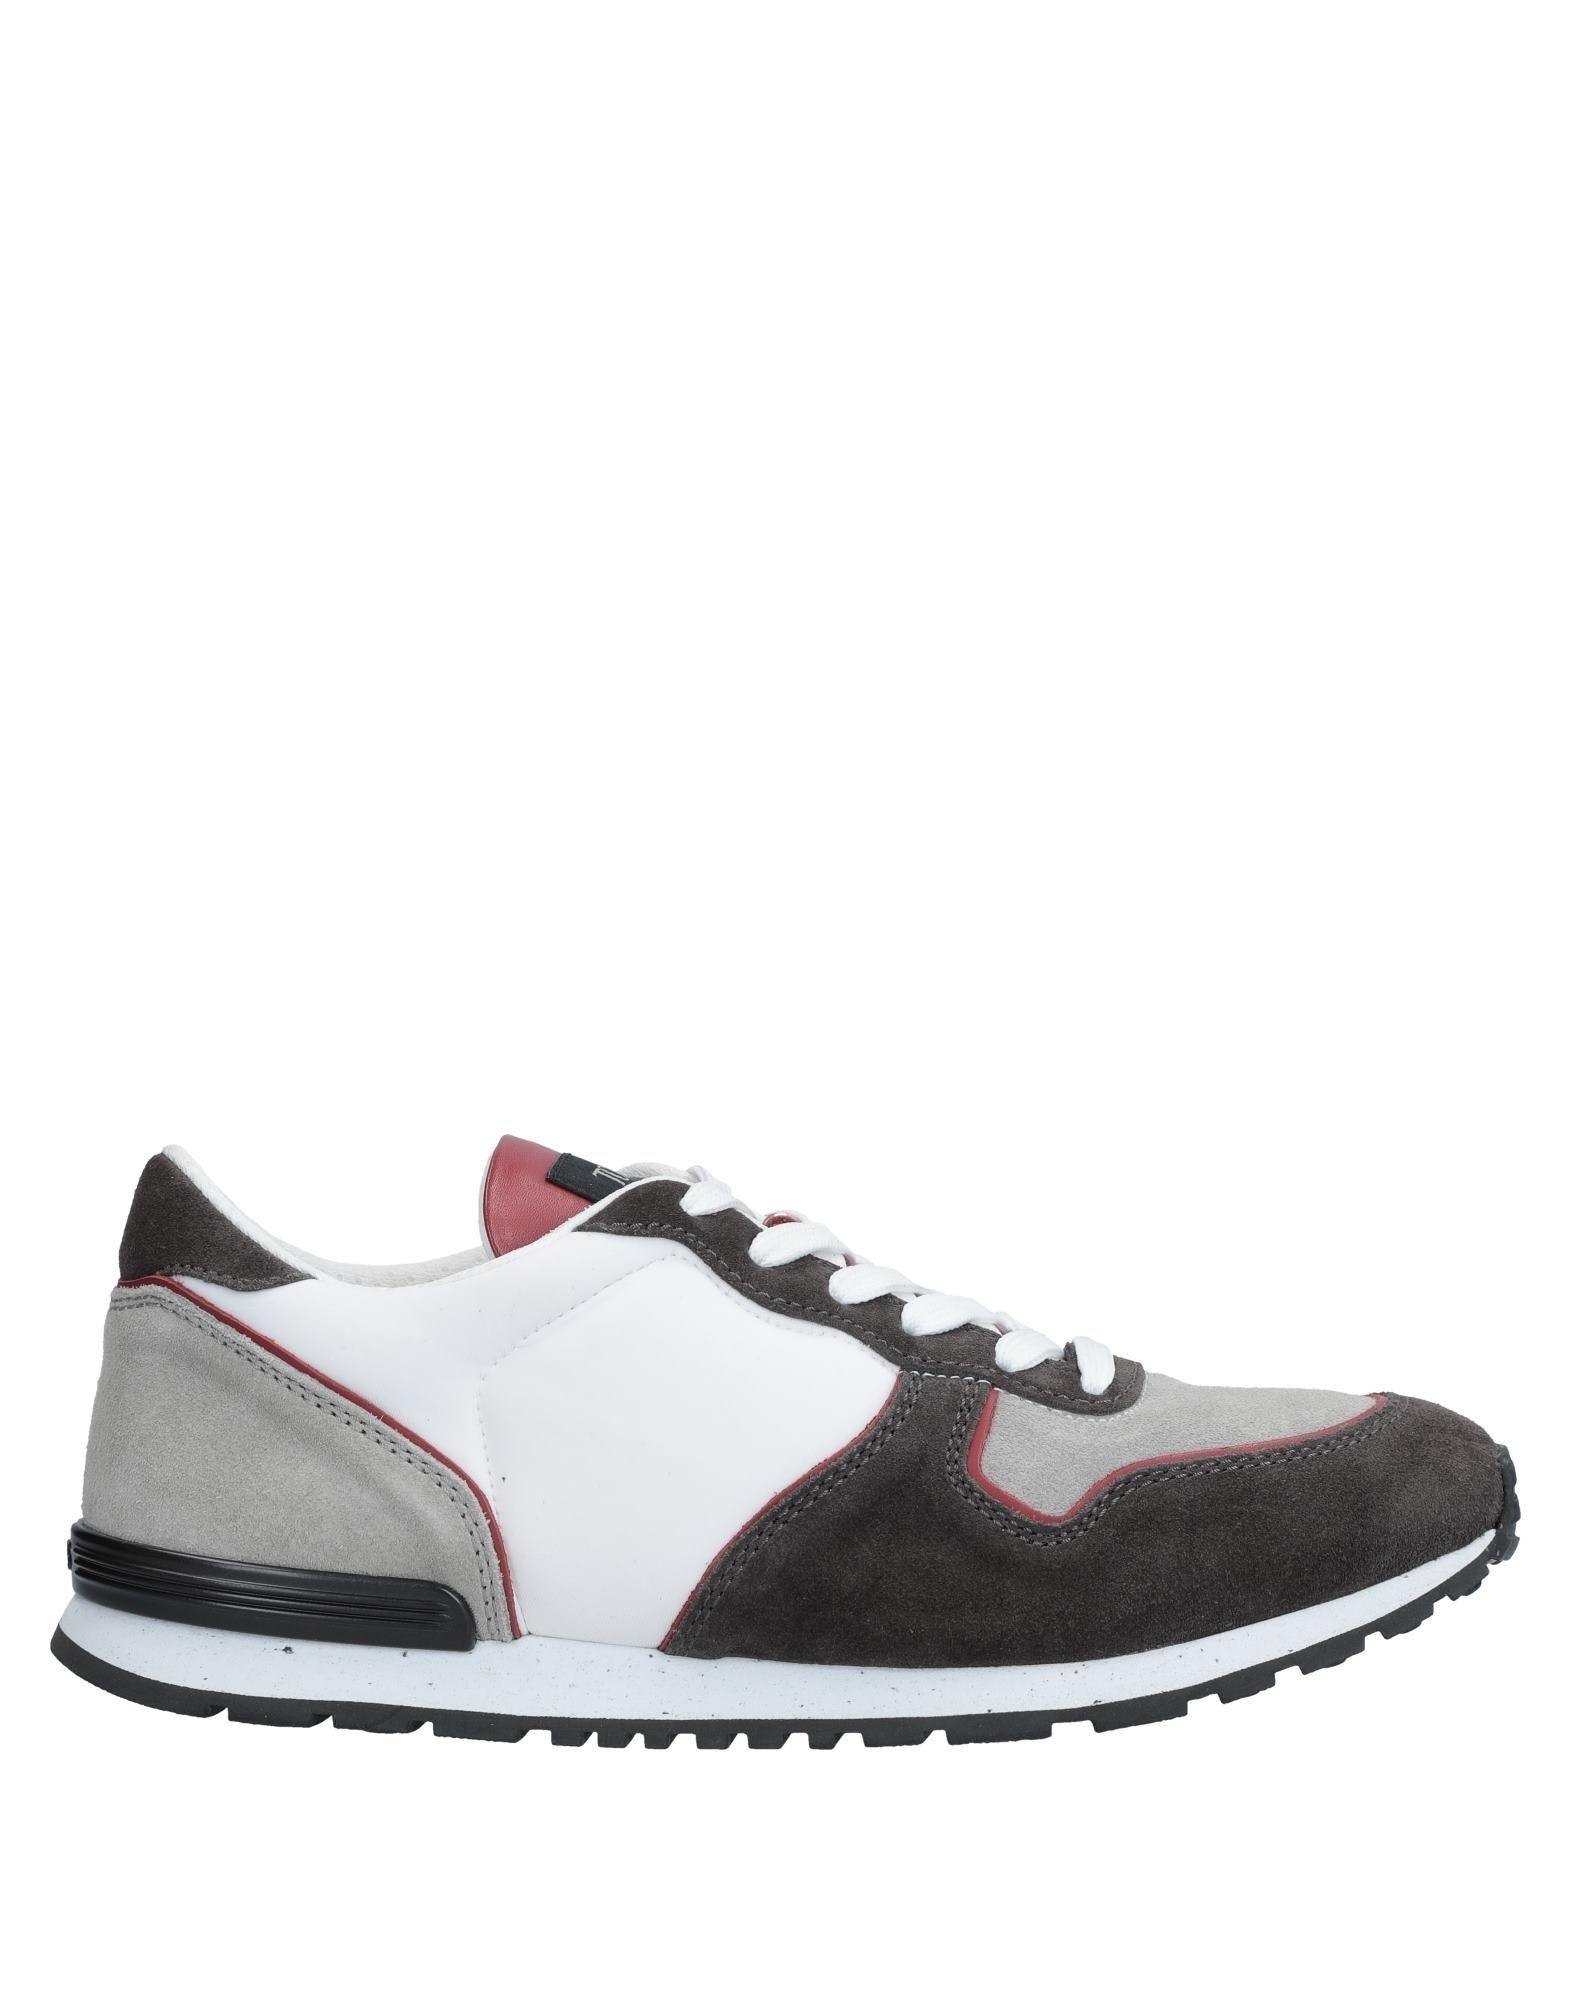 A buon mercato Sneakers Tod's Uomo - 11541975WB